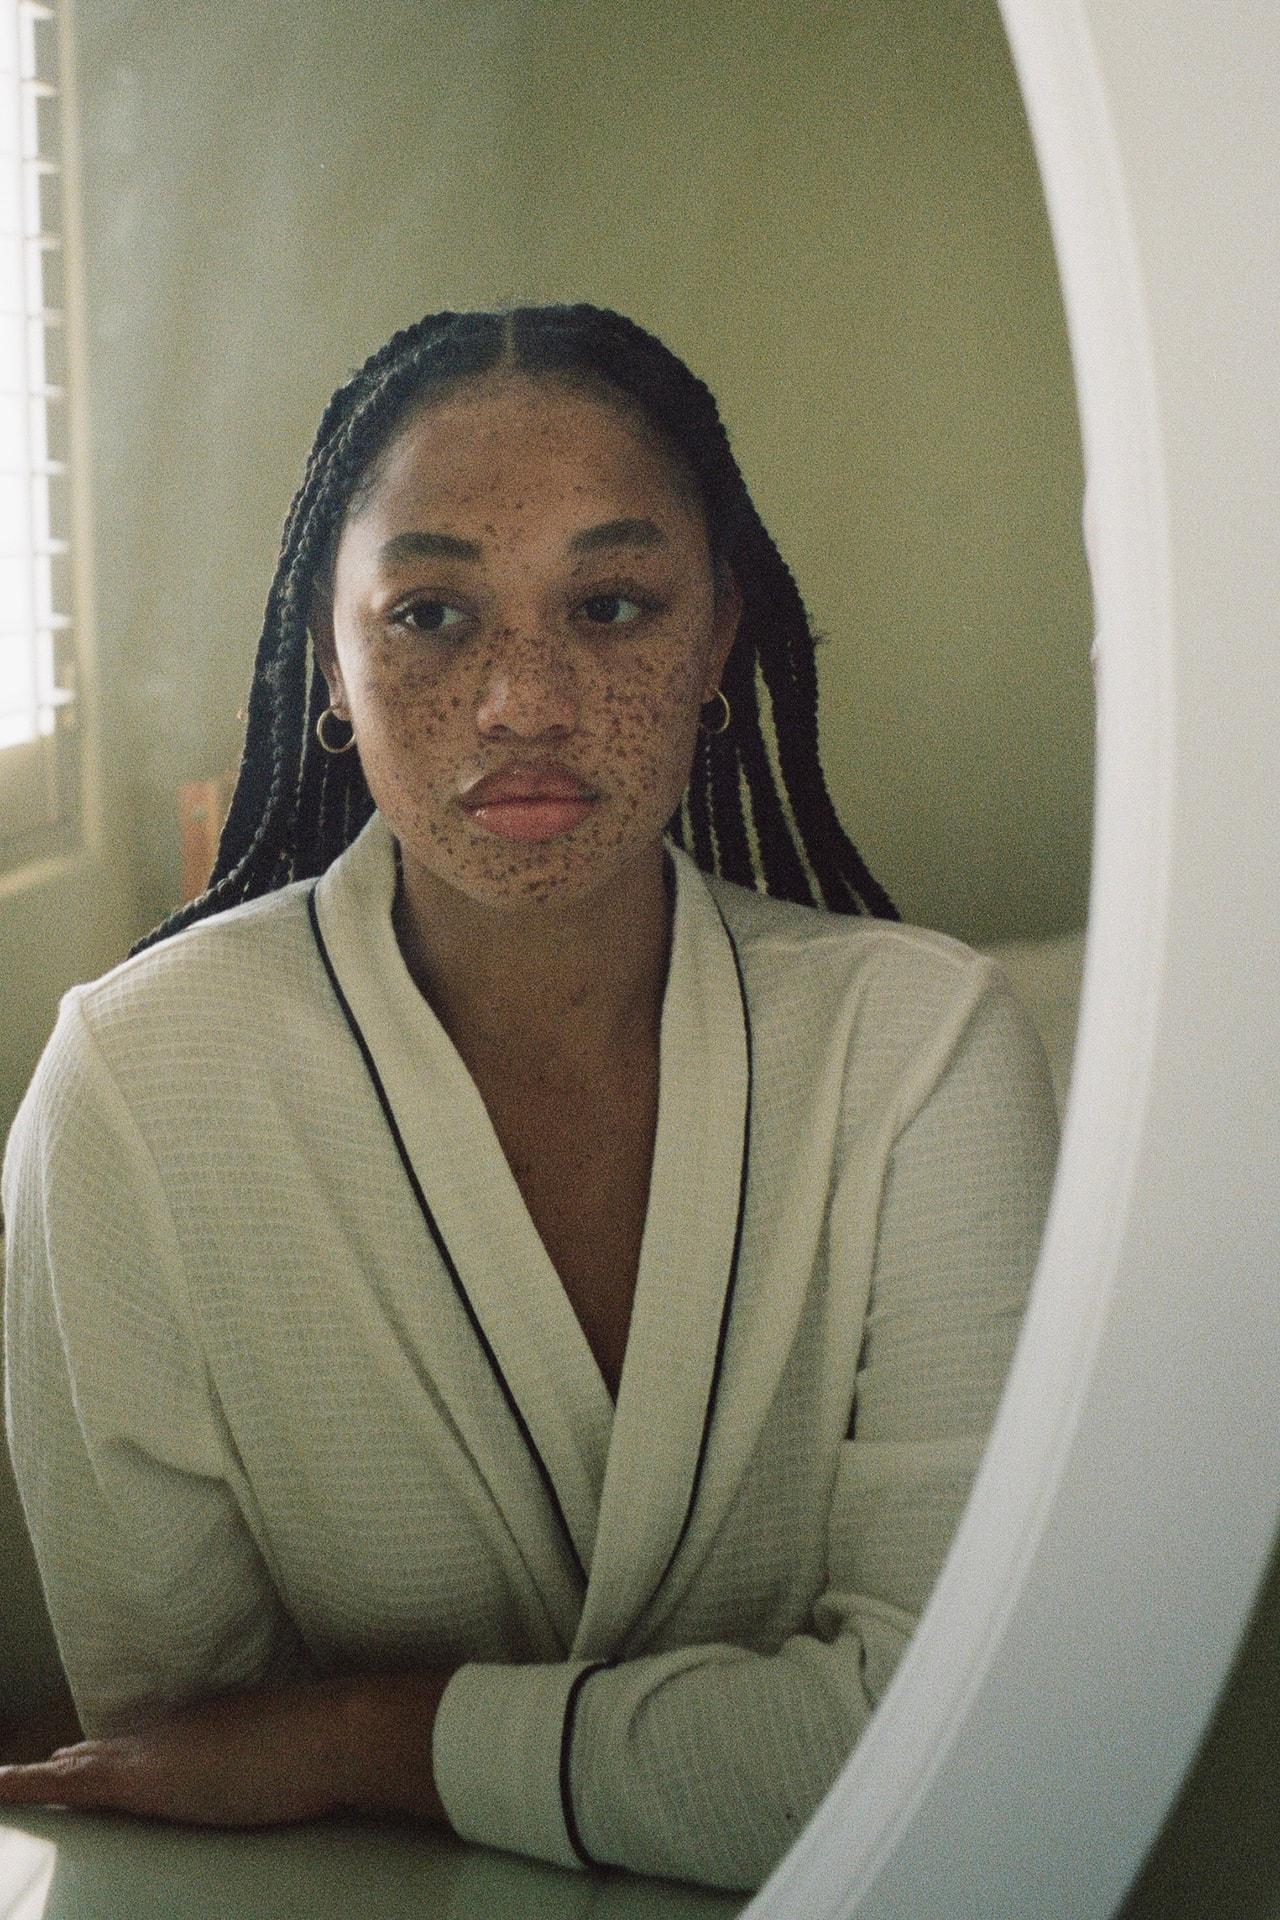 Salem Mitchell Model Los Angeles Beauty Makeup Glossier Lip Gloss Clear Bathrobe Freckles